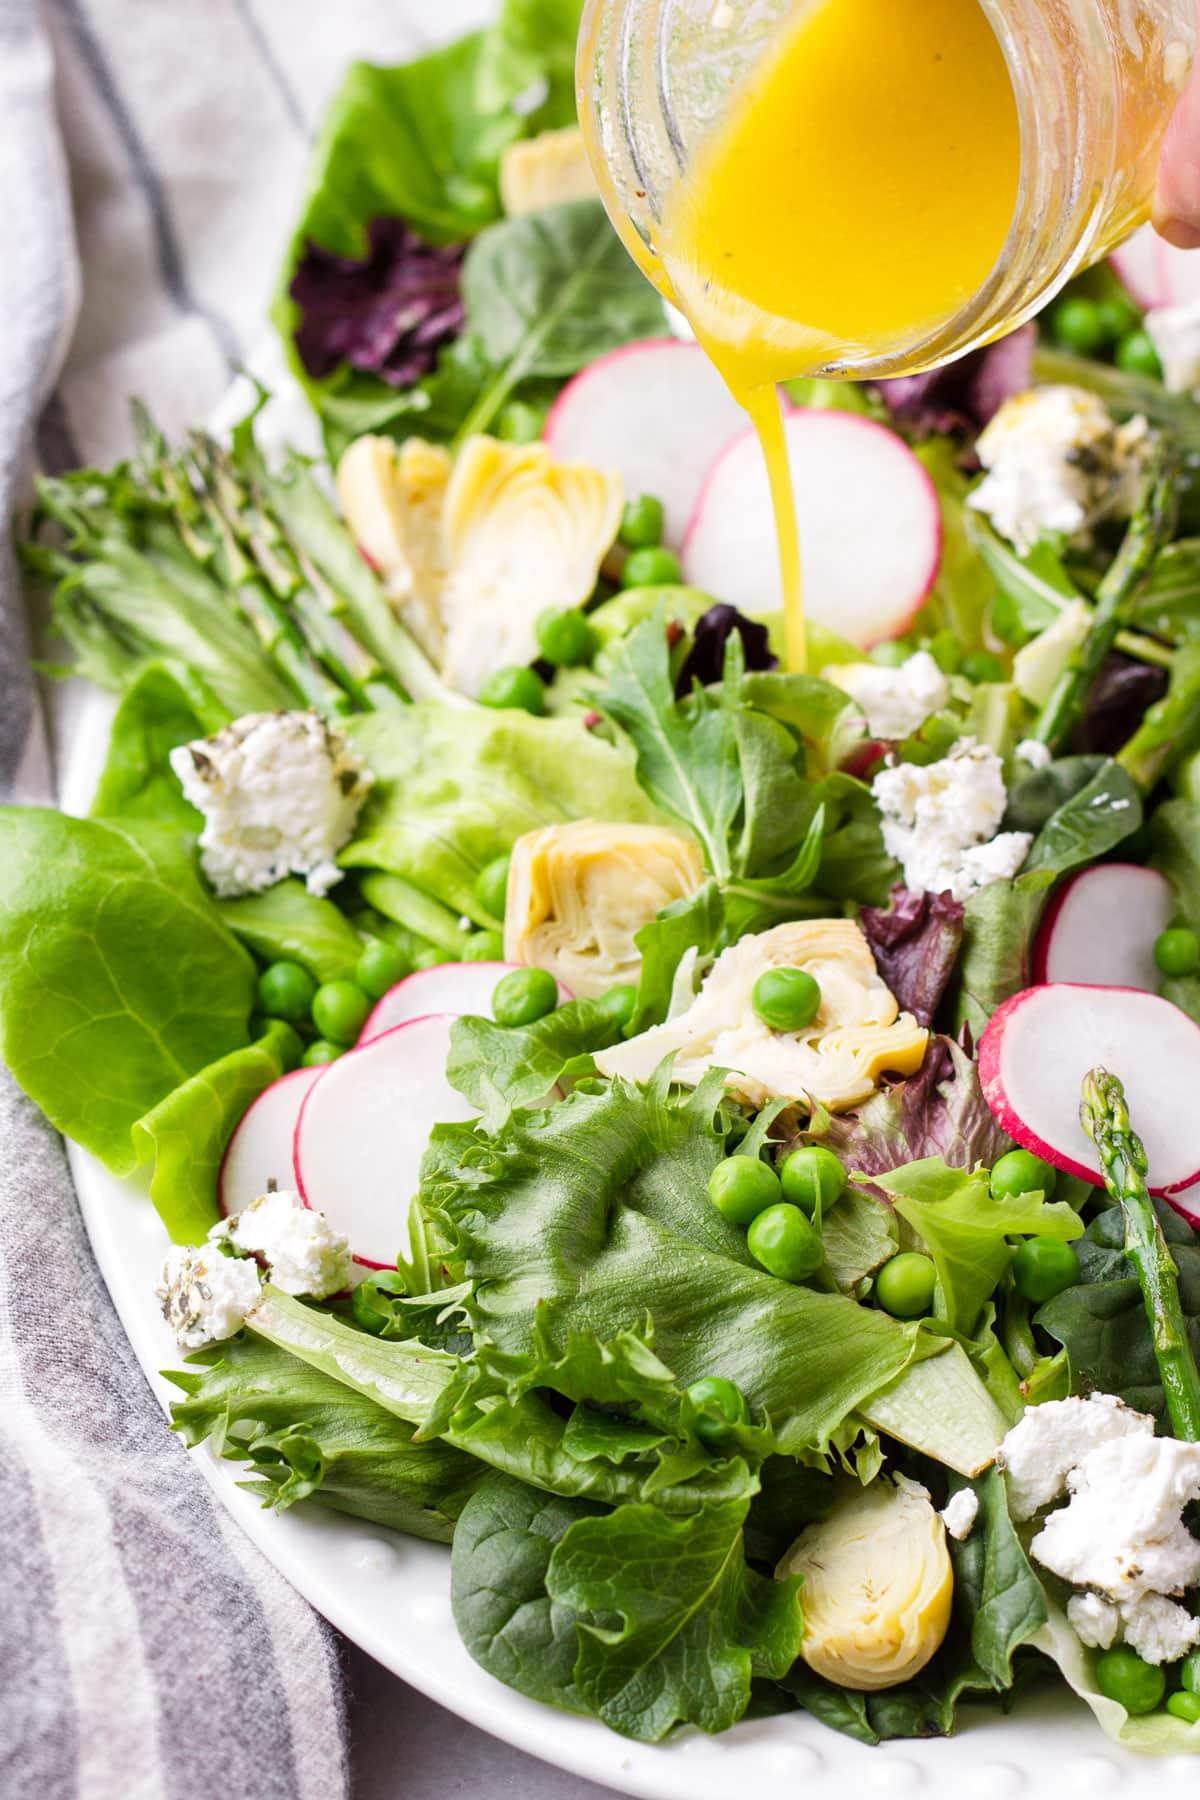 lemon dressing in a jar being poured onto a platter of seasonal greens salad